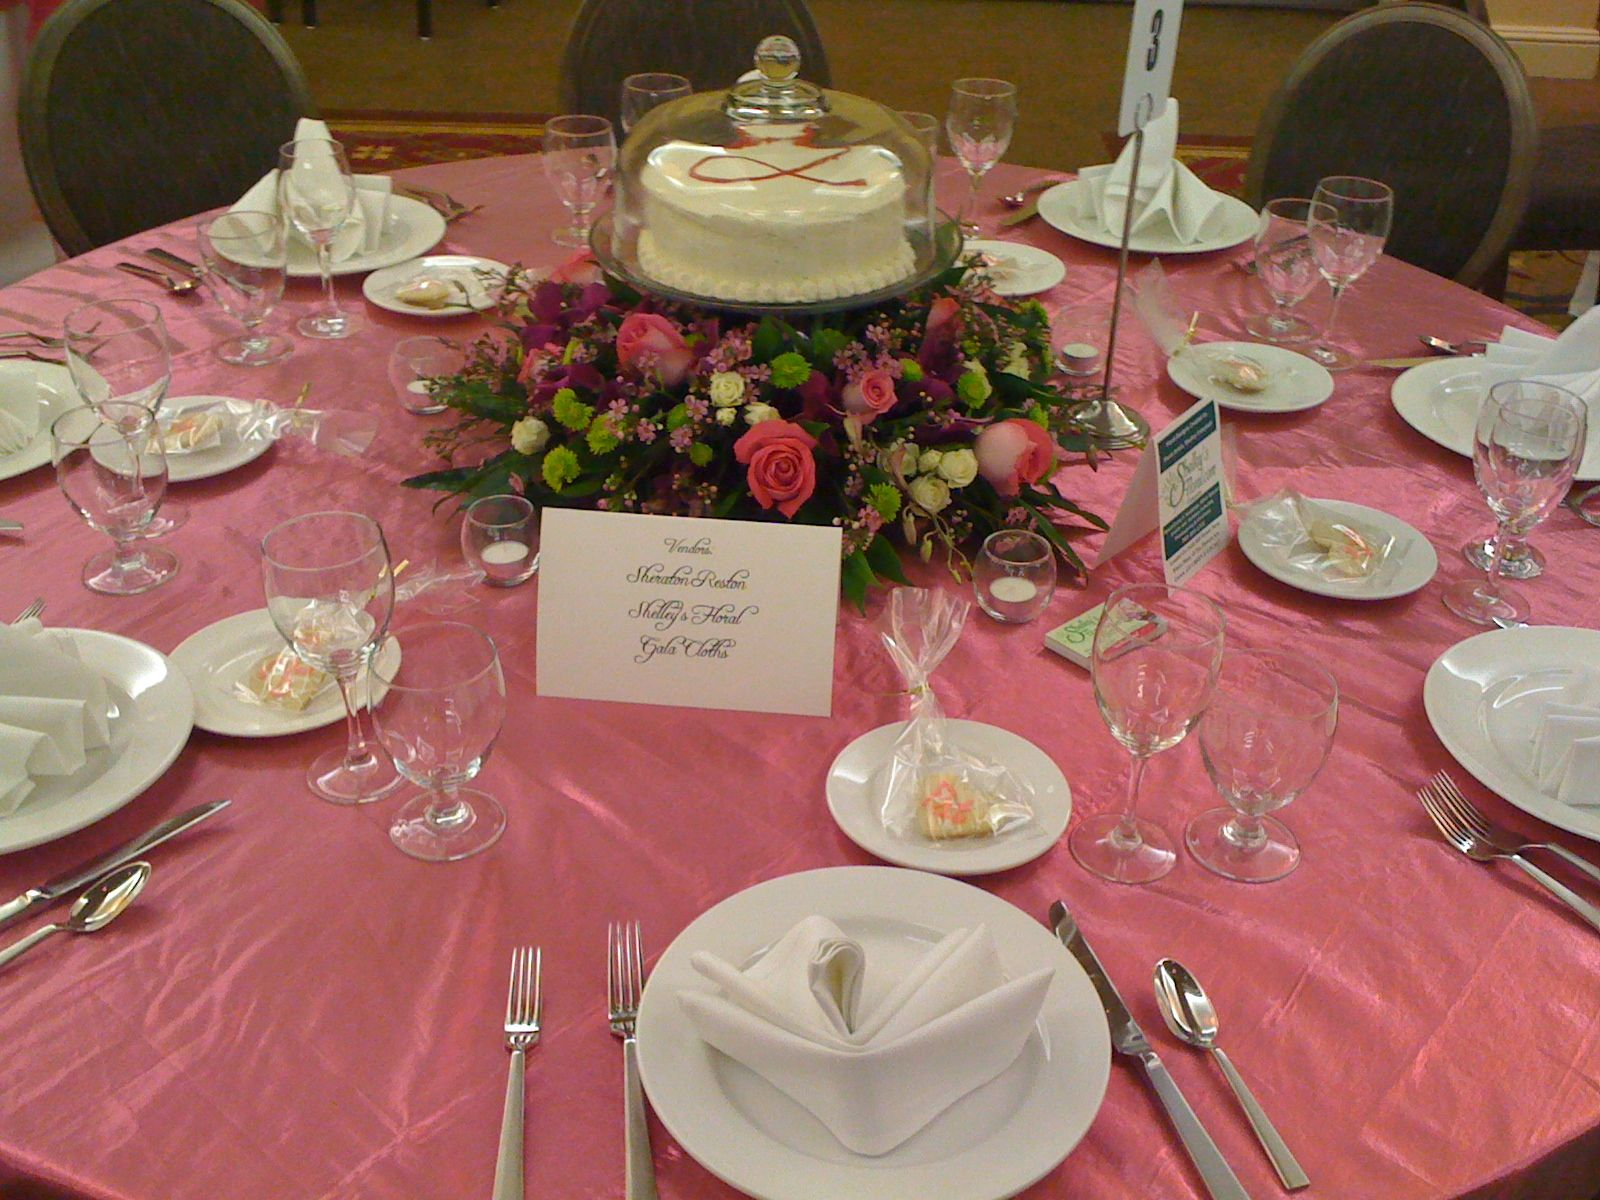 Groovy Mini Cakes As Centerpieces Nancys Wedding In 2019 Download Free Architecture Designs Pendunizatbritishbridgeorg